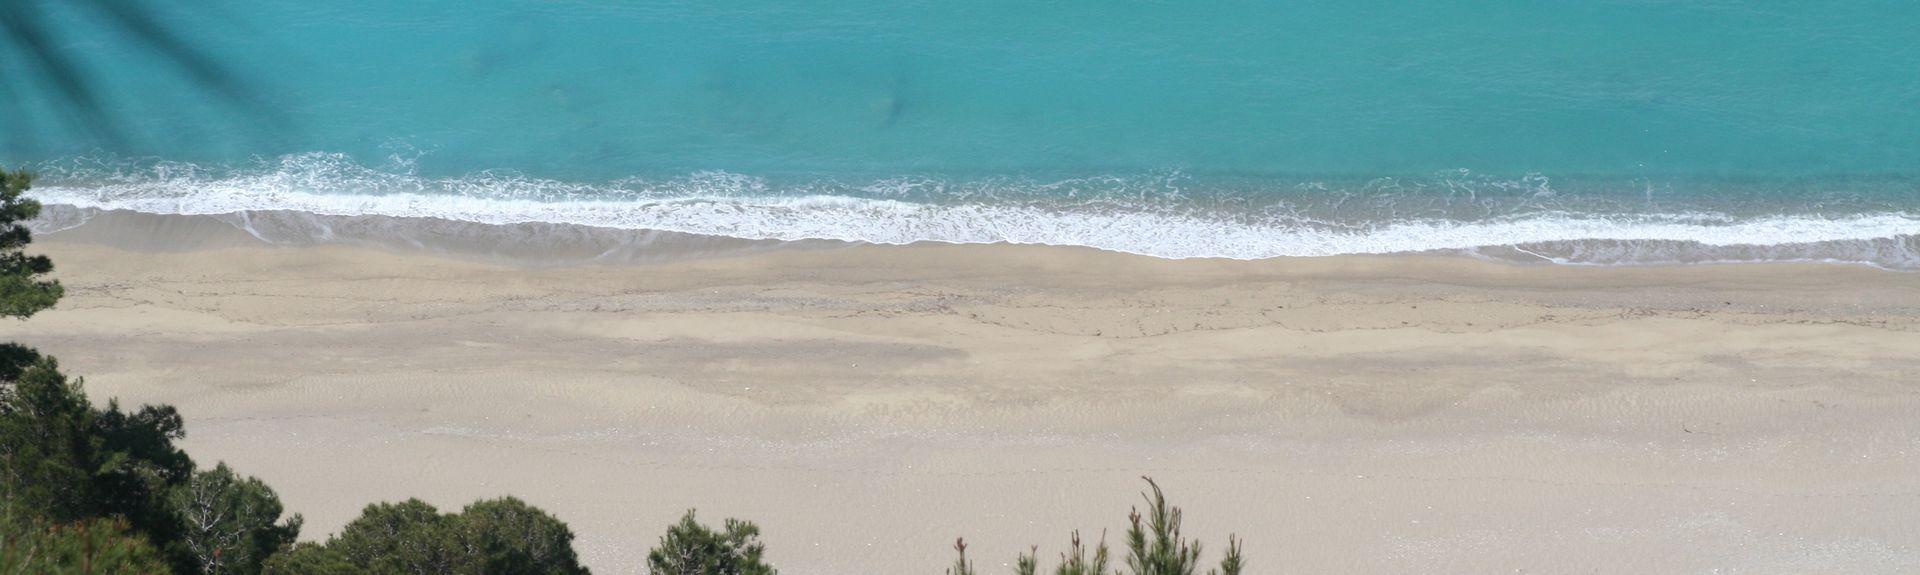 Sfakiotes, Peloponnese, West Greece and Ionian Sea, Kreikka